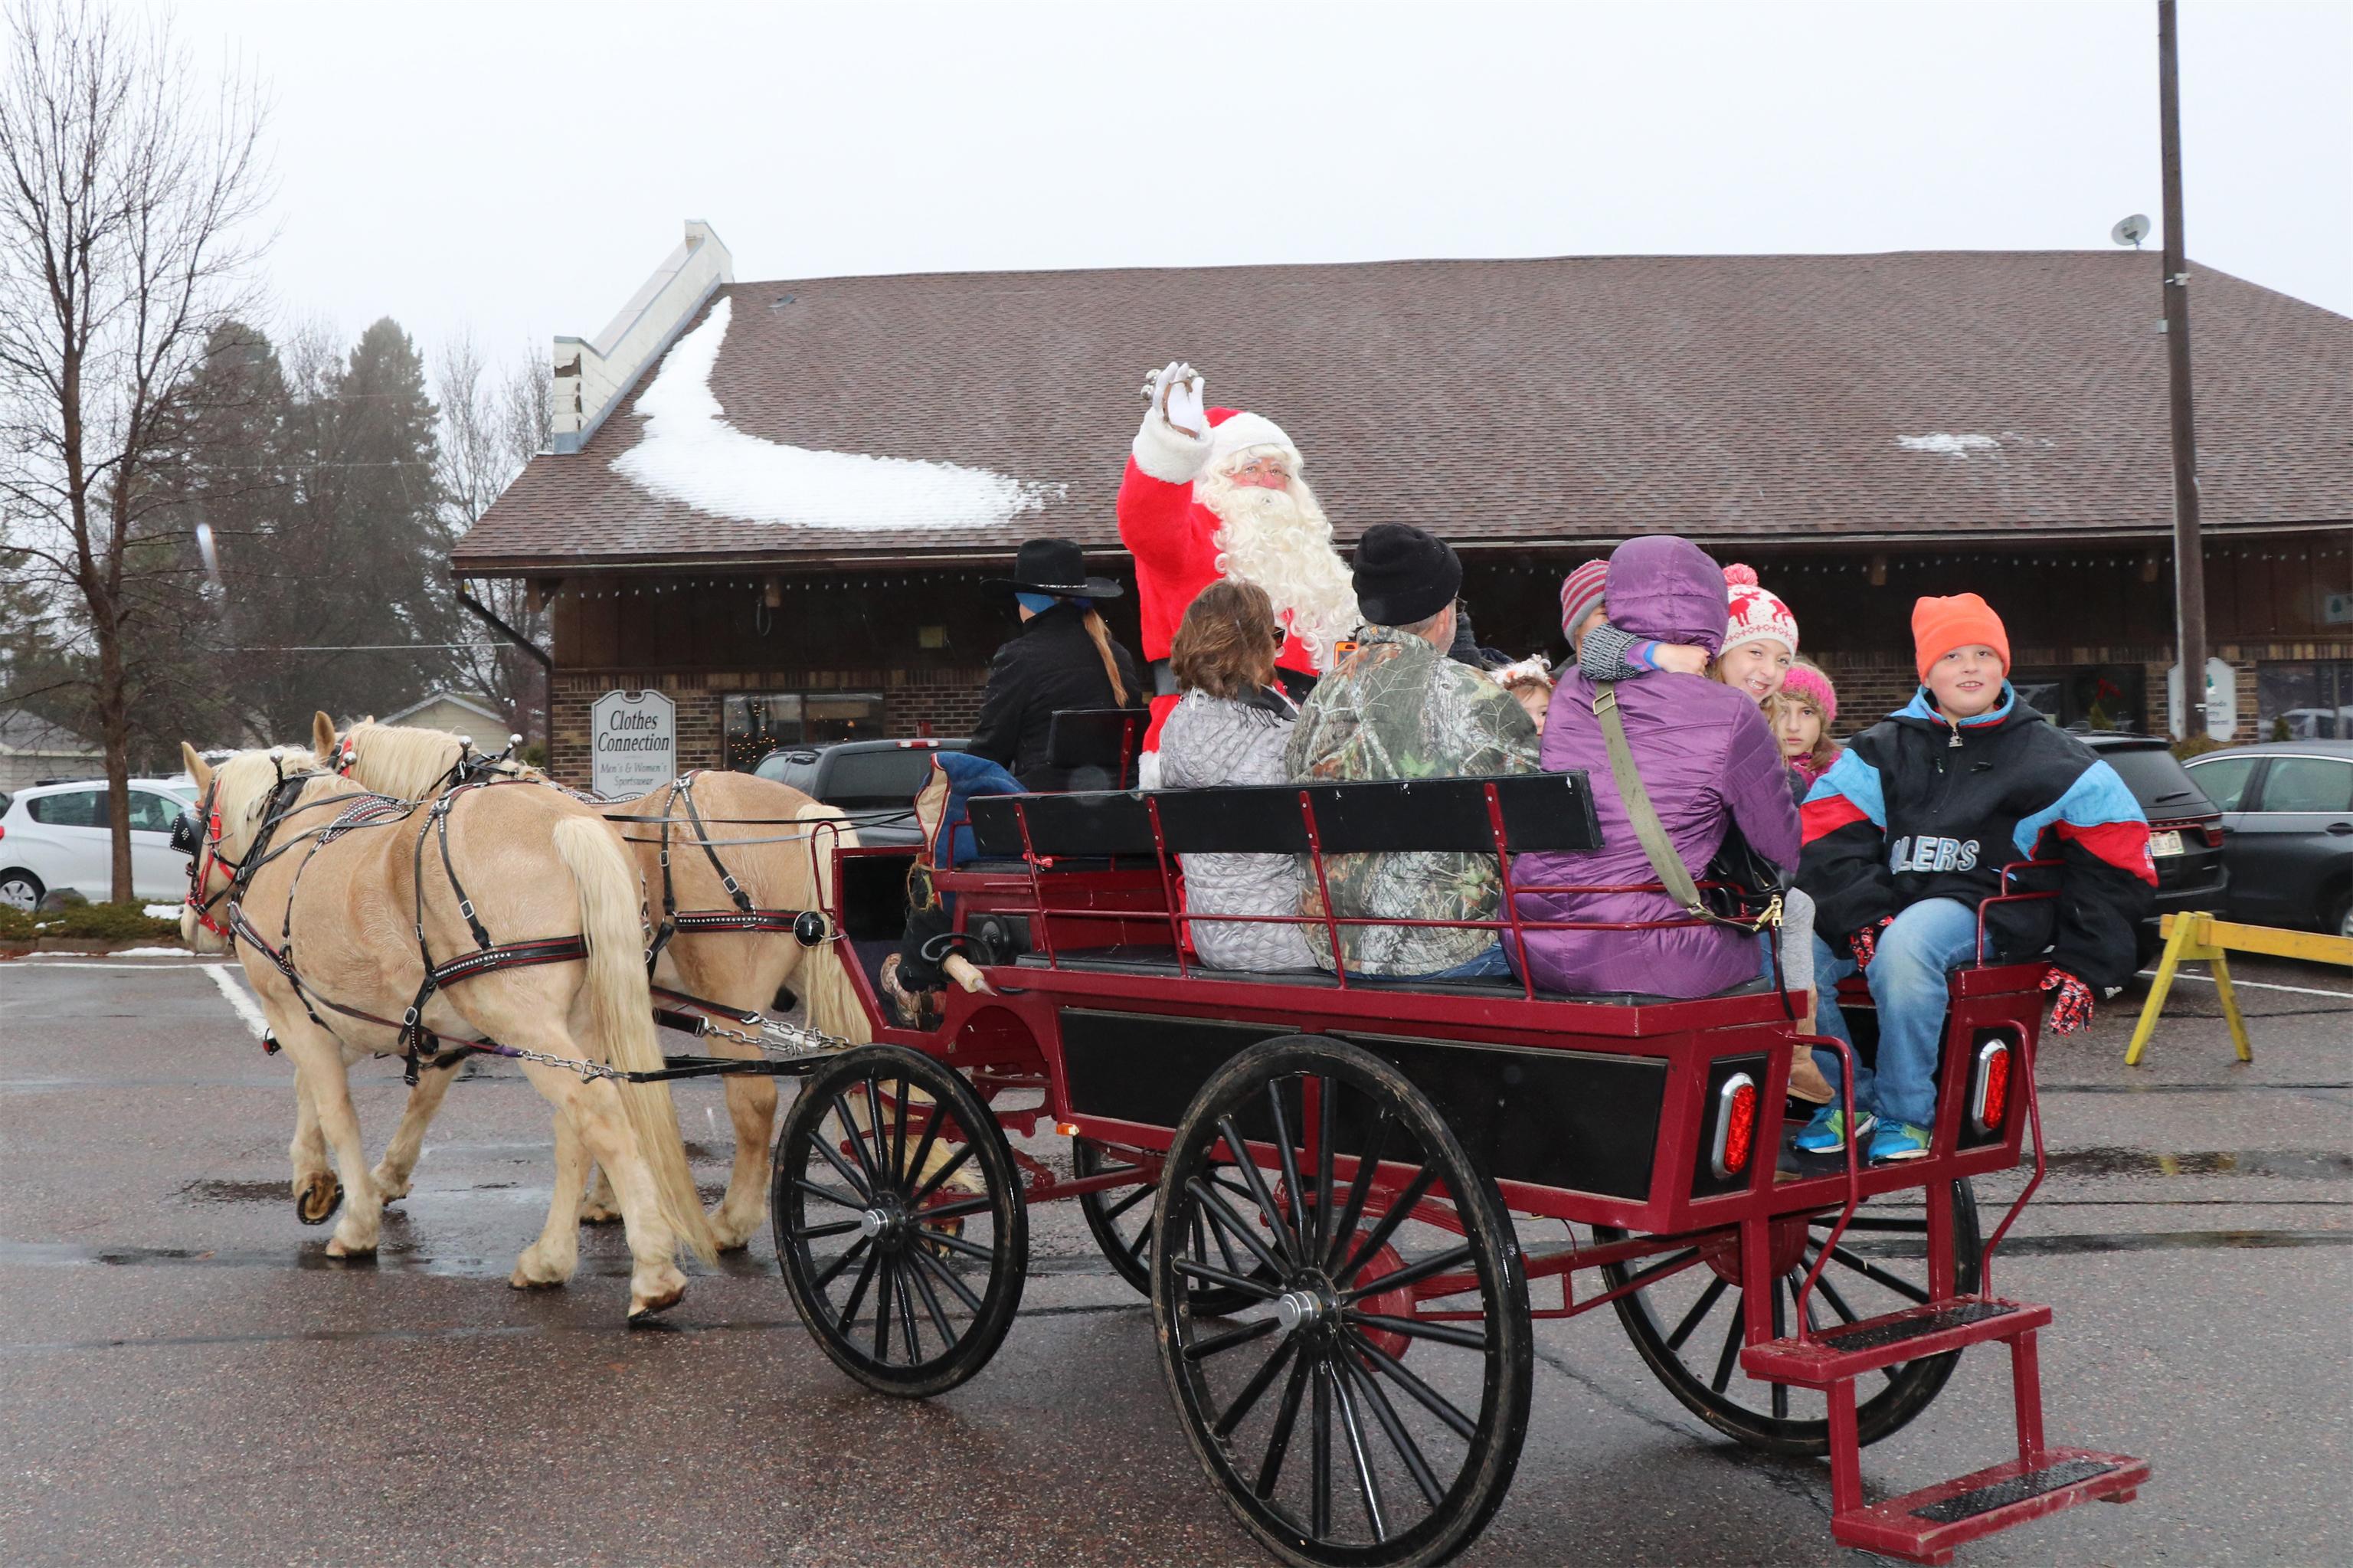 After arriving in Minocqua, Santa rides through town in a horse-drawn wagon. Kim Johnson photo